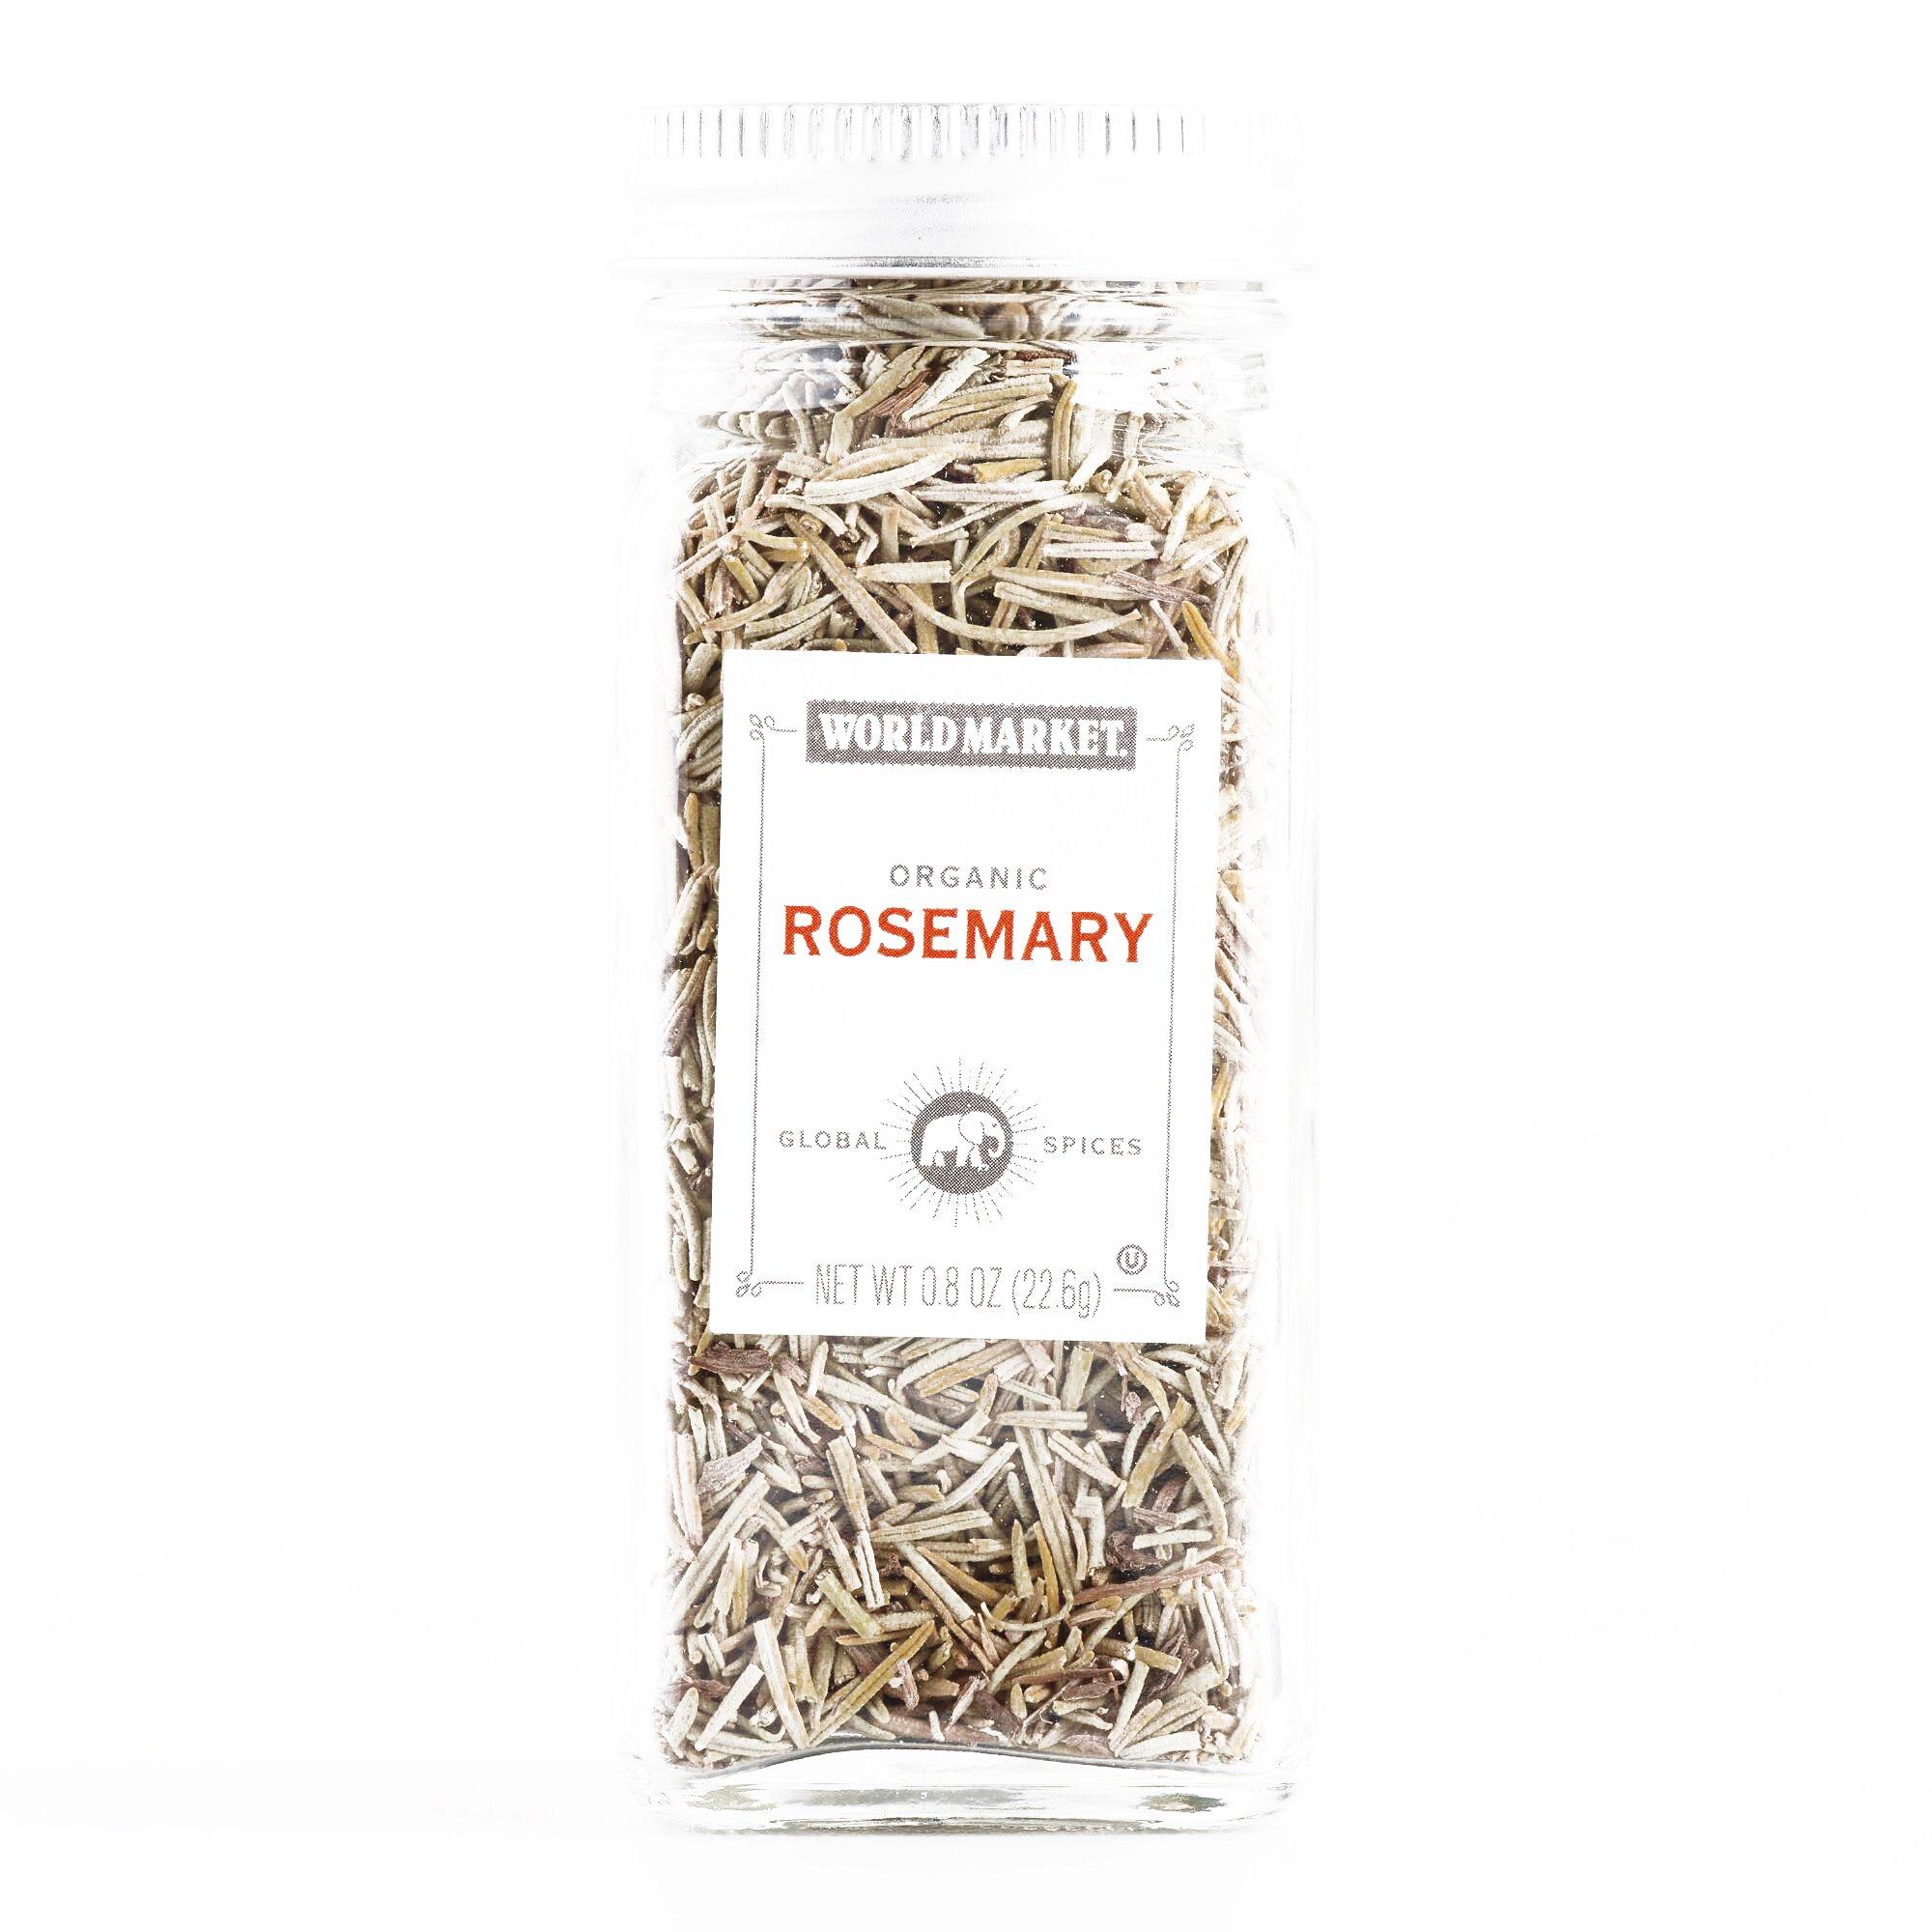 Rosemary .8 oz each (3 Items Per Order, not per case)